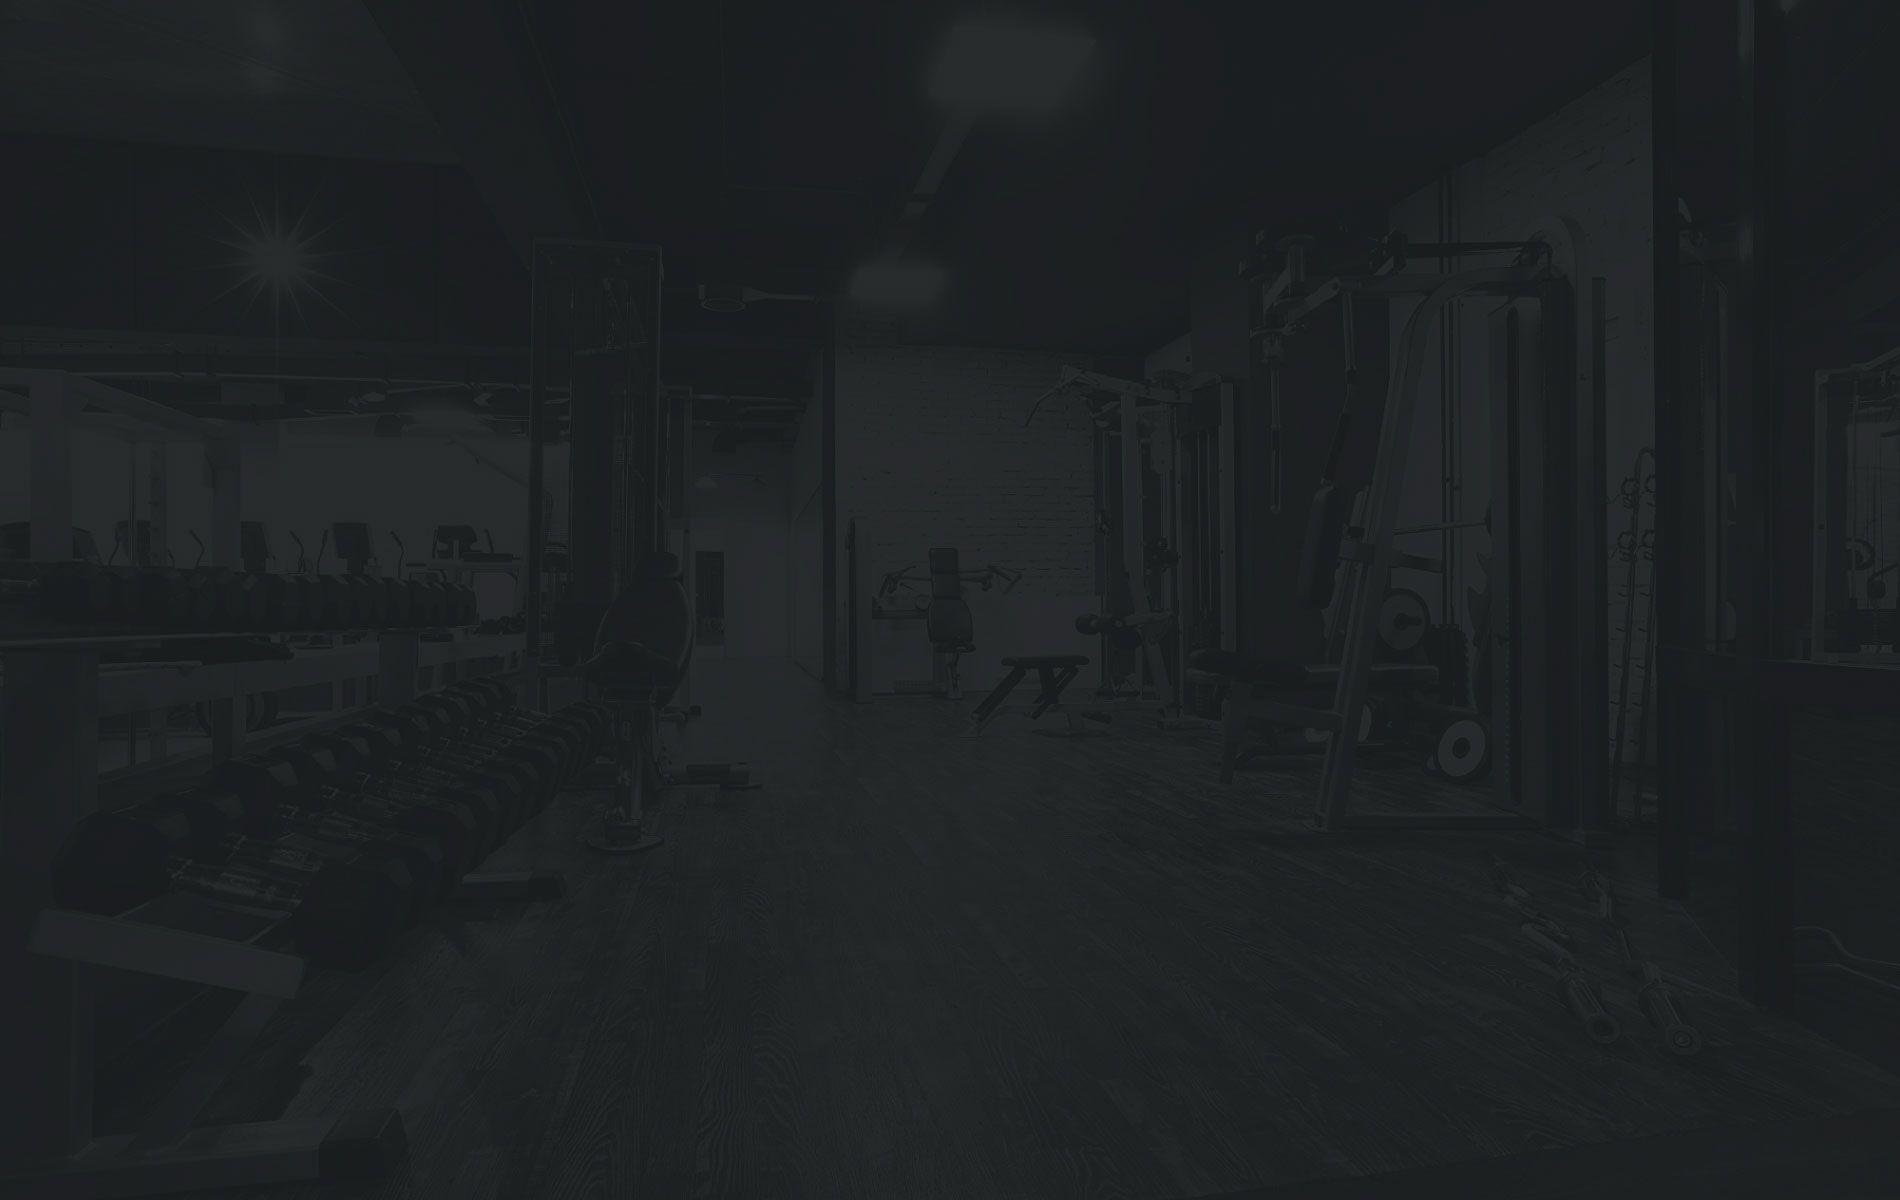 gym_bkgd_bw-compressor